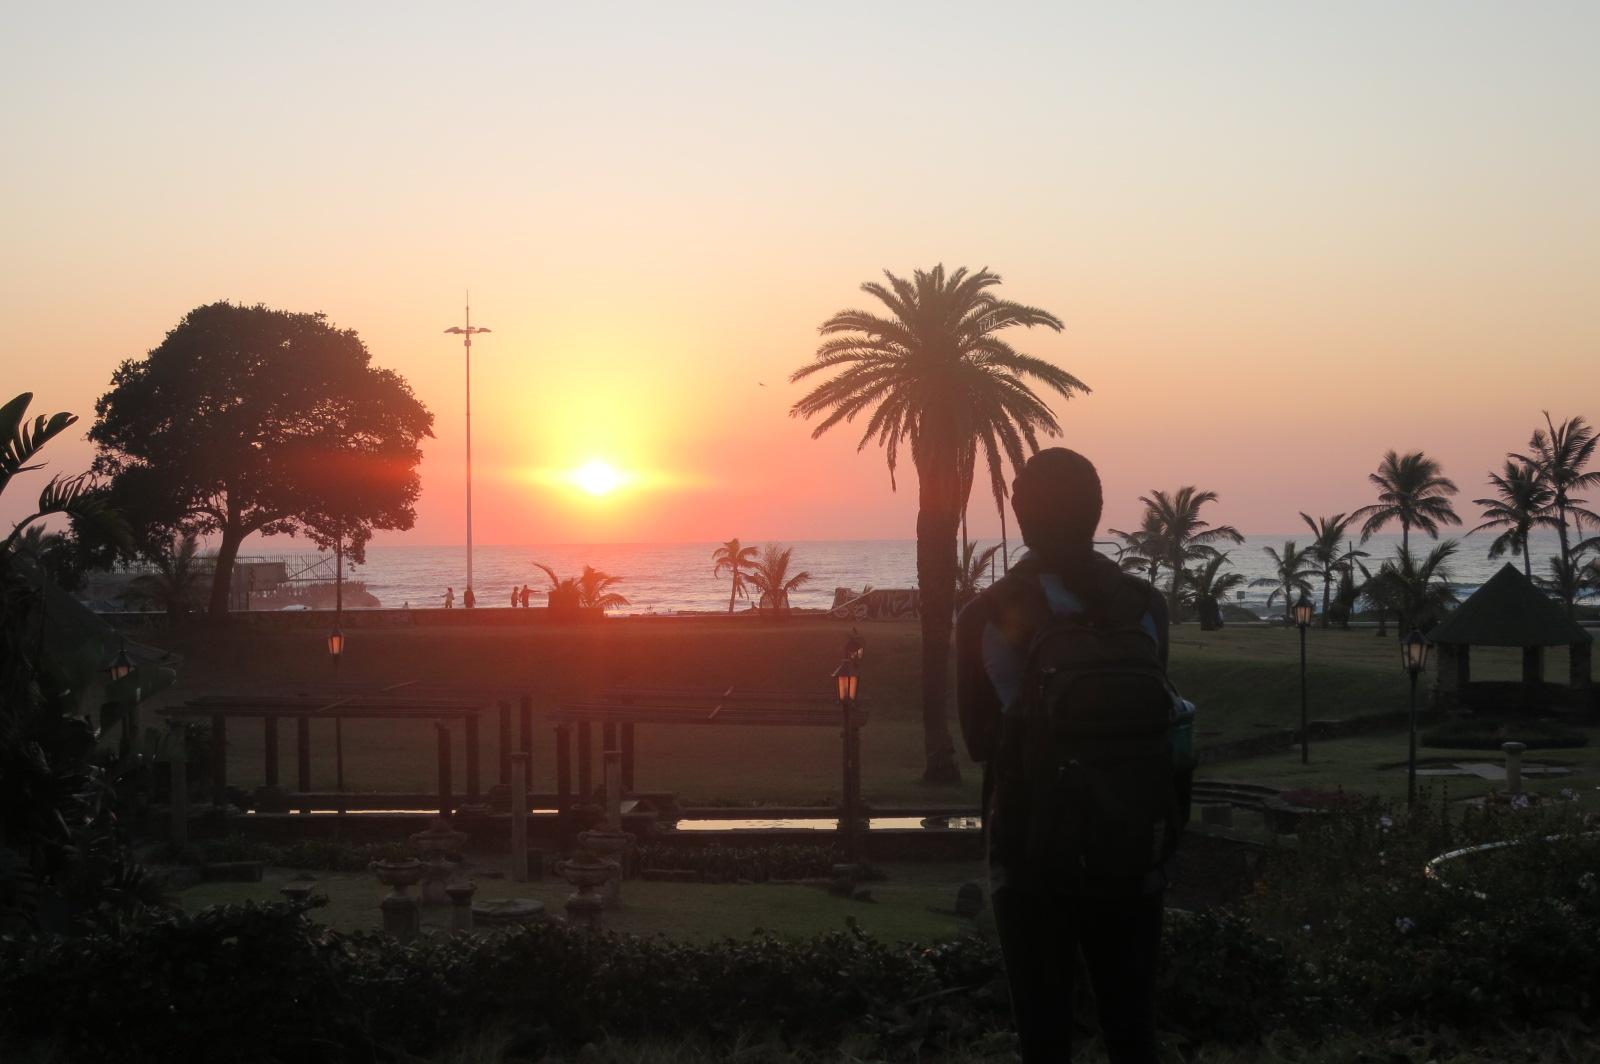 Sunrise in Durban, South Africa